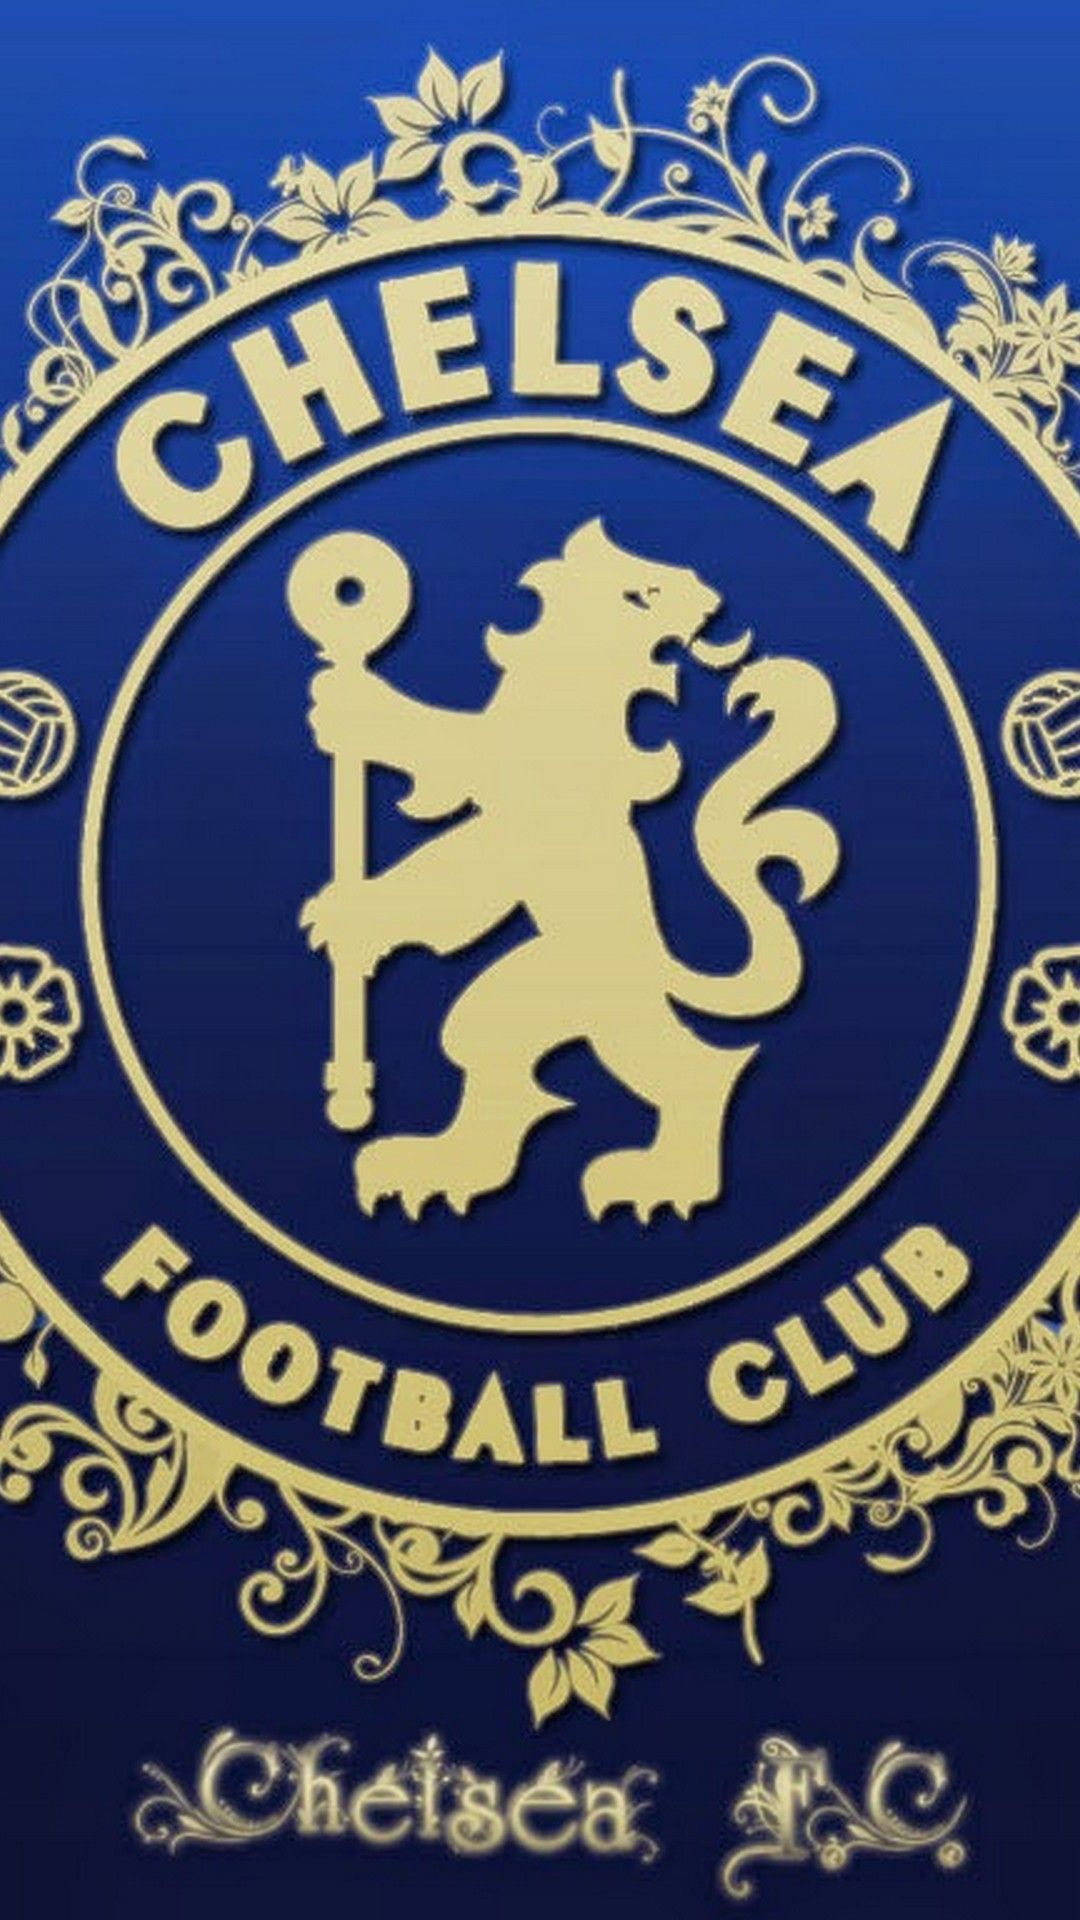 Chelsea Football Club Iphone Wallpapers Best Wallpaper Hd Chelsea Football Club Wallpapers Chelsea Football Club Football Wallpaper